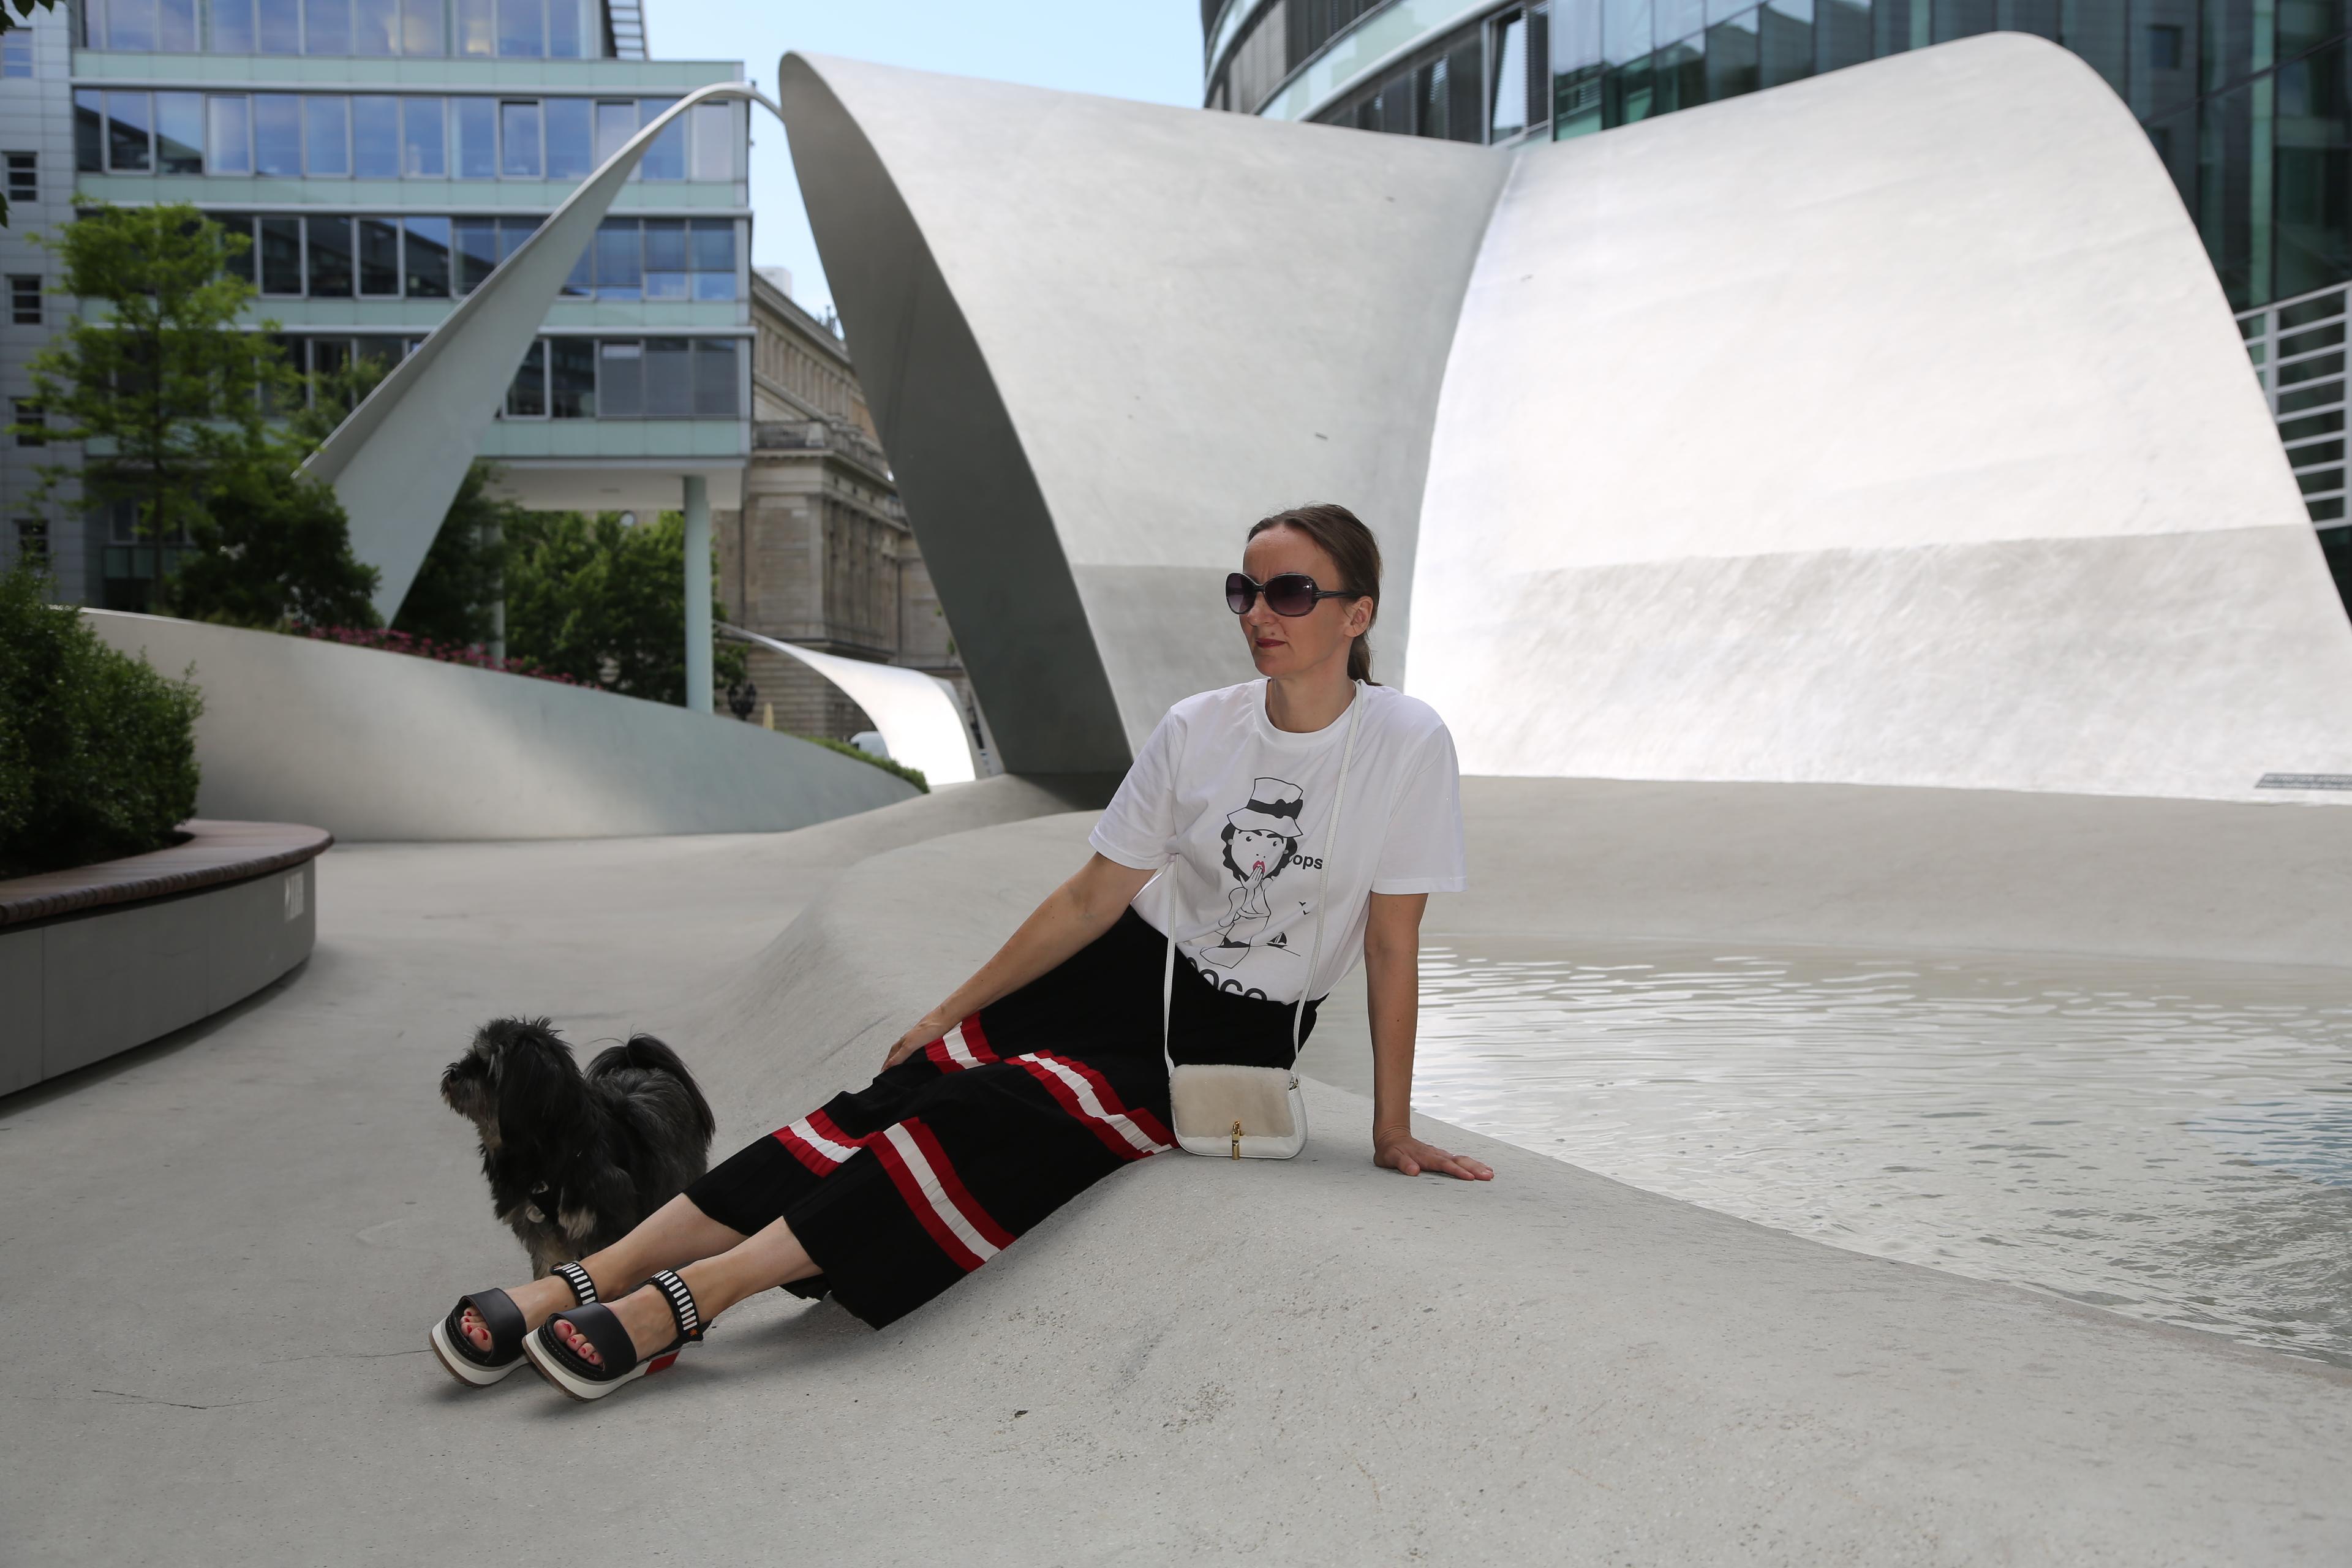 sandale-oceanblue-style_faltenrock_sandalen_prada_art-shoes_t-shirt_chanel_tasche-klein_plateau-sandalen_mode-blog-ü40 (3)